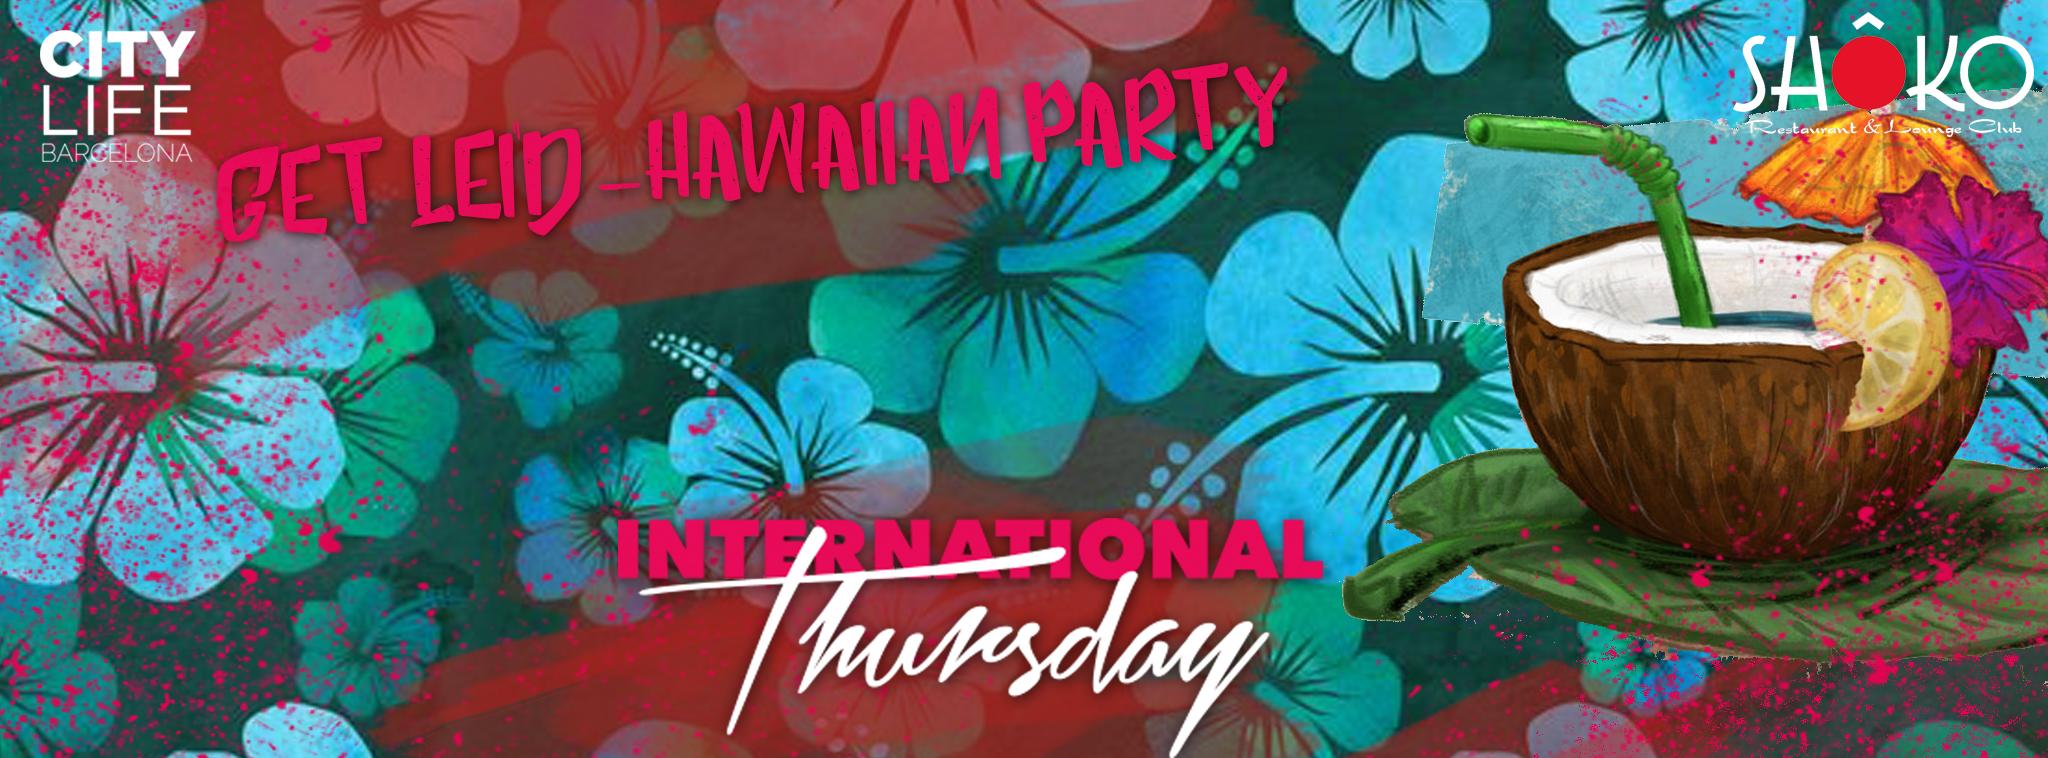 Get Lei'd - Hawaiian Night with Free Dinner, 3 Free Drinks & Party! @Shoko Lounge Club!